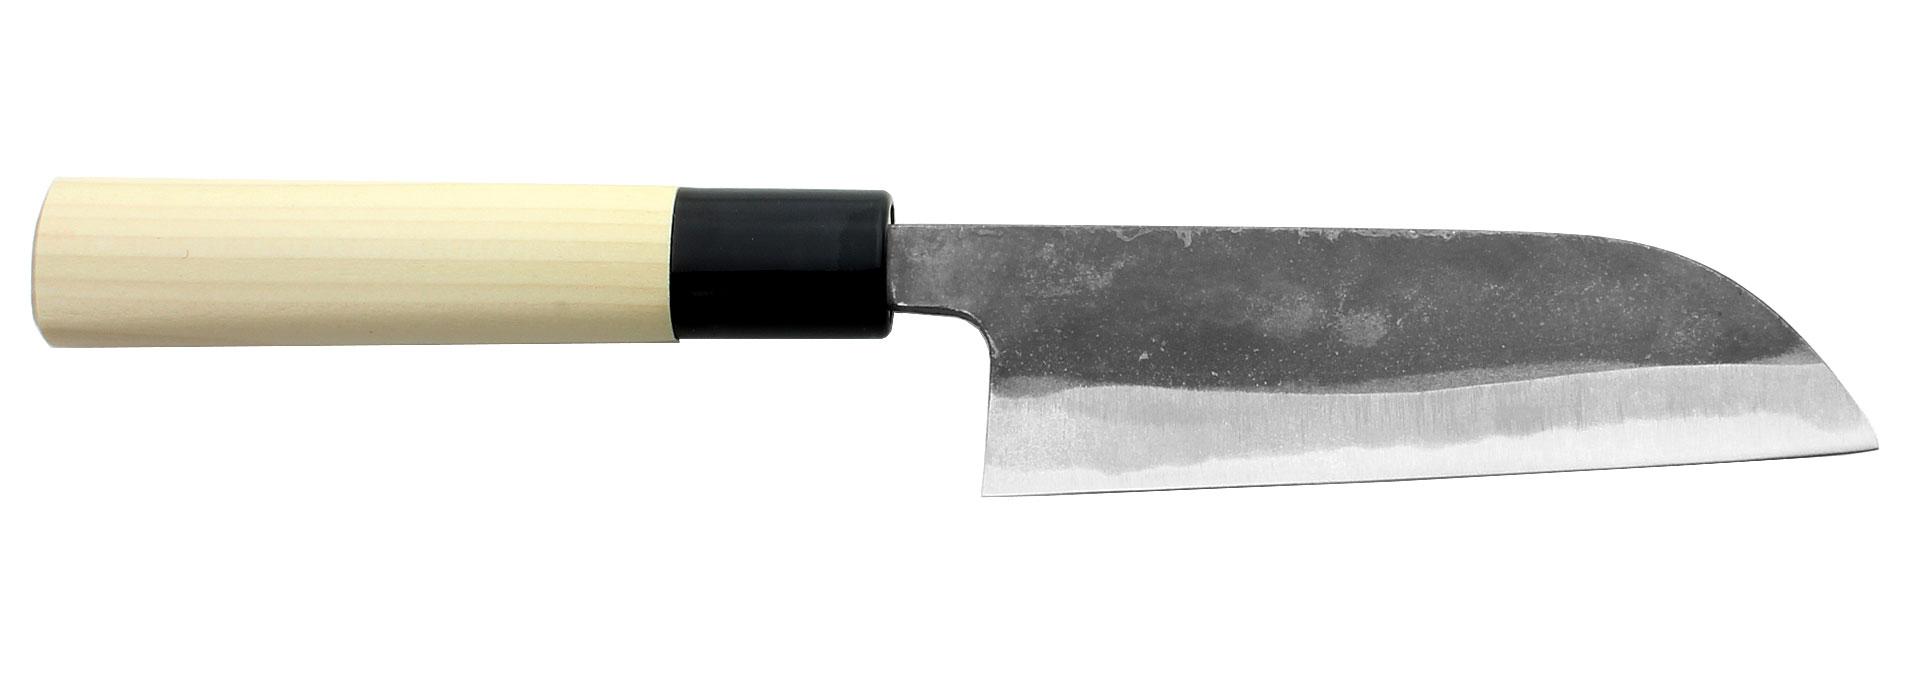 handmade kitchen knives made by katsushige anryu